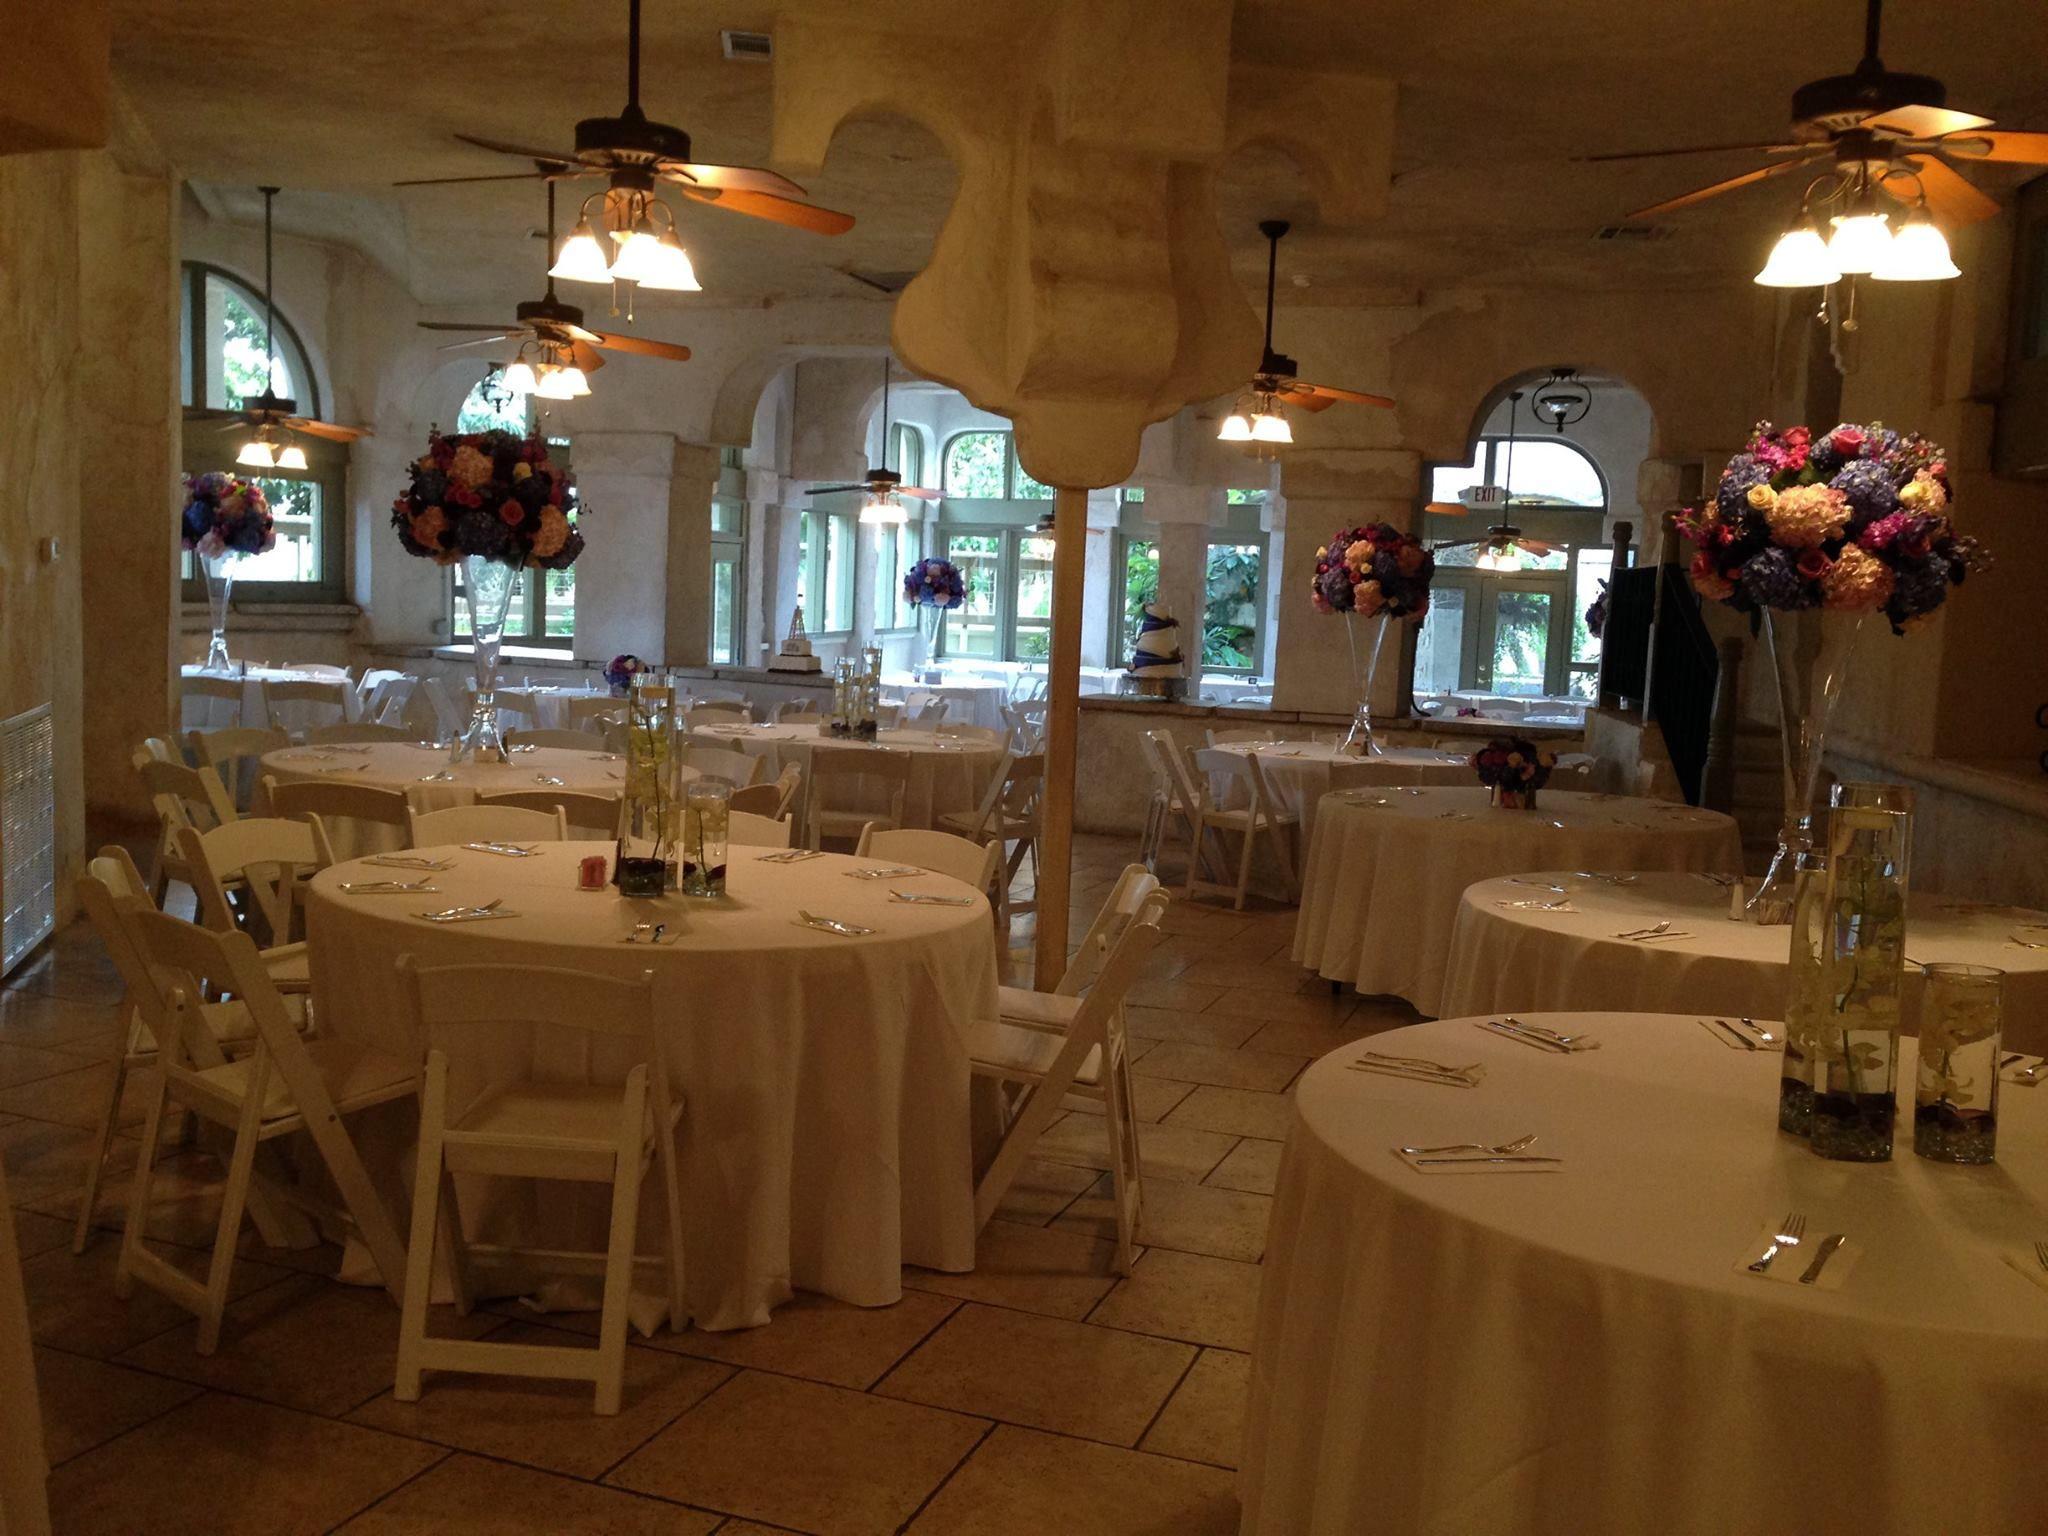 Wedding hall decoration images  Pin by Casey Thornton on Wedding u Reception Flowers u Decorations